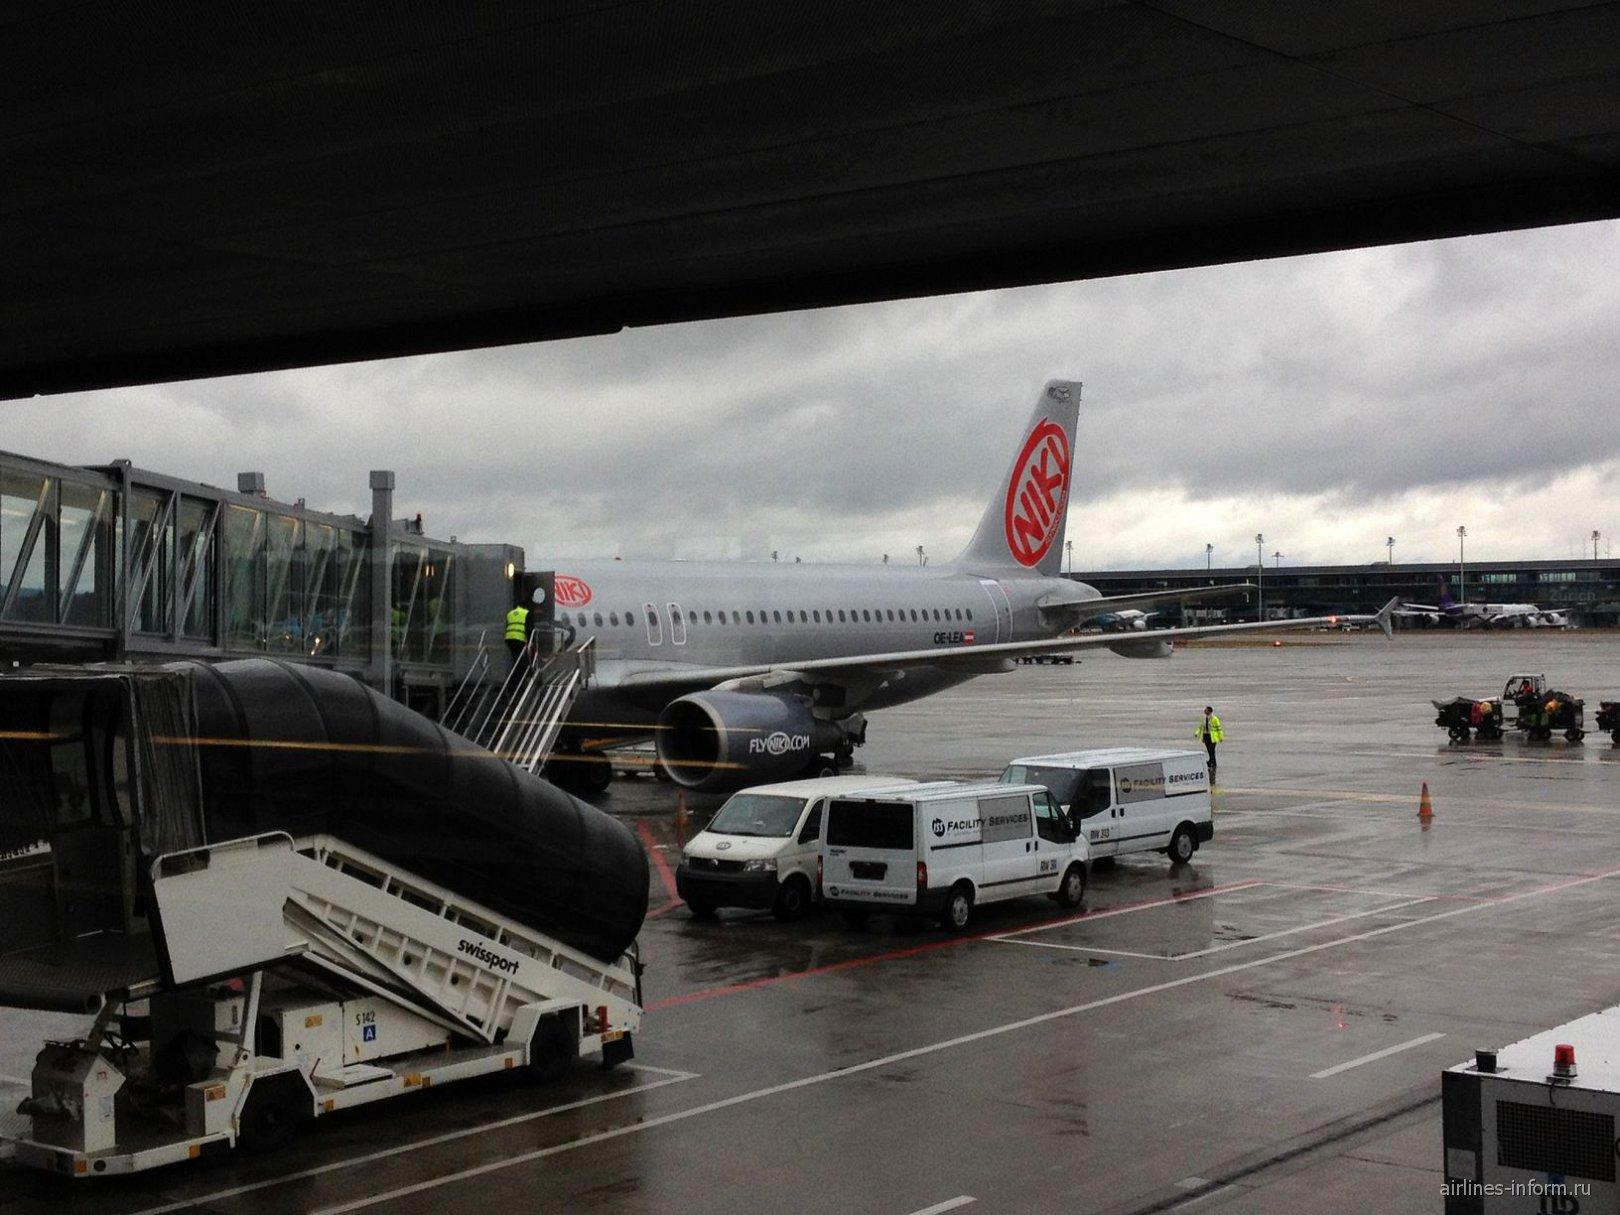 Airbus A320 авиакомпании Niki в аэропорту Цюриха